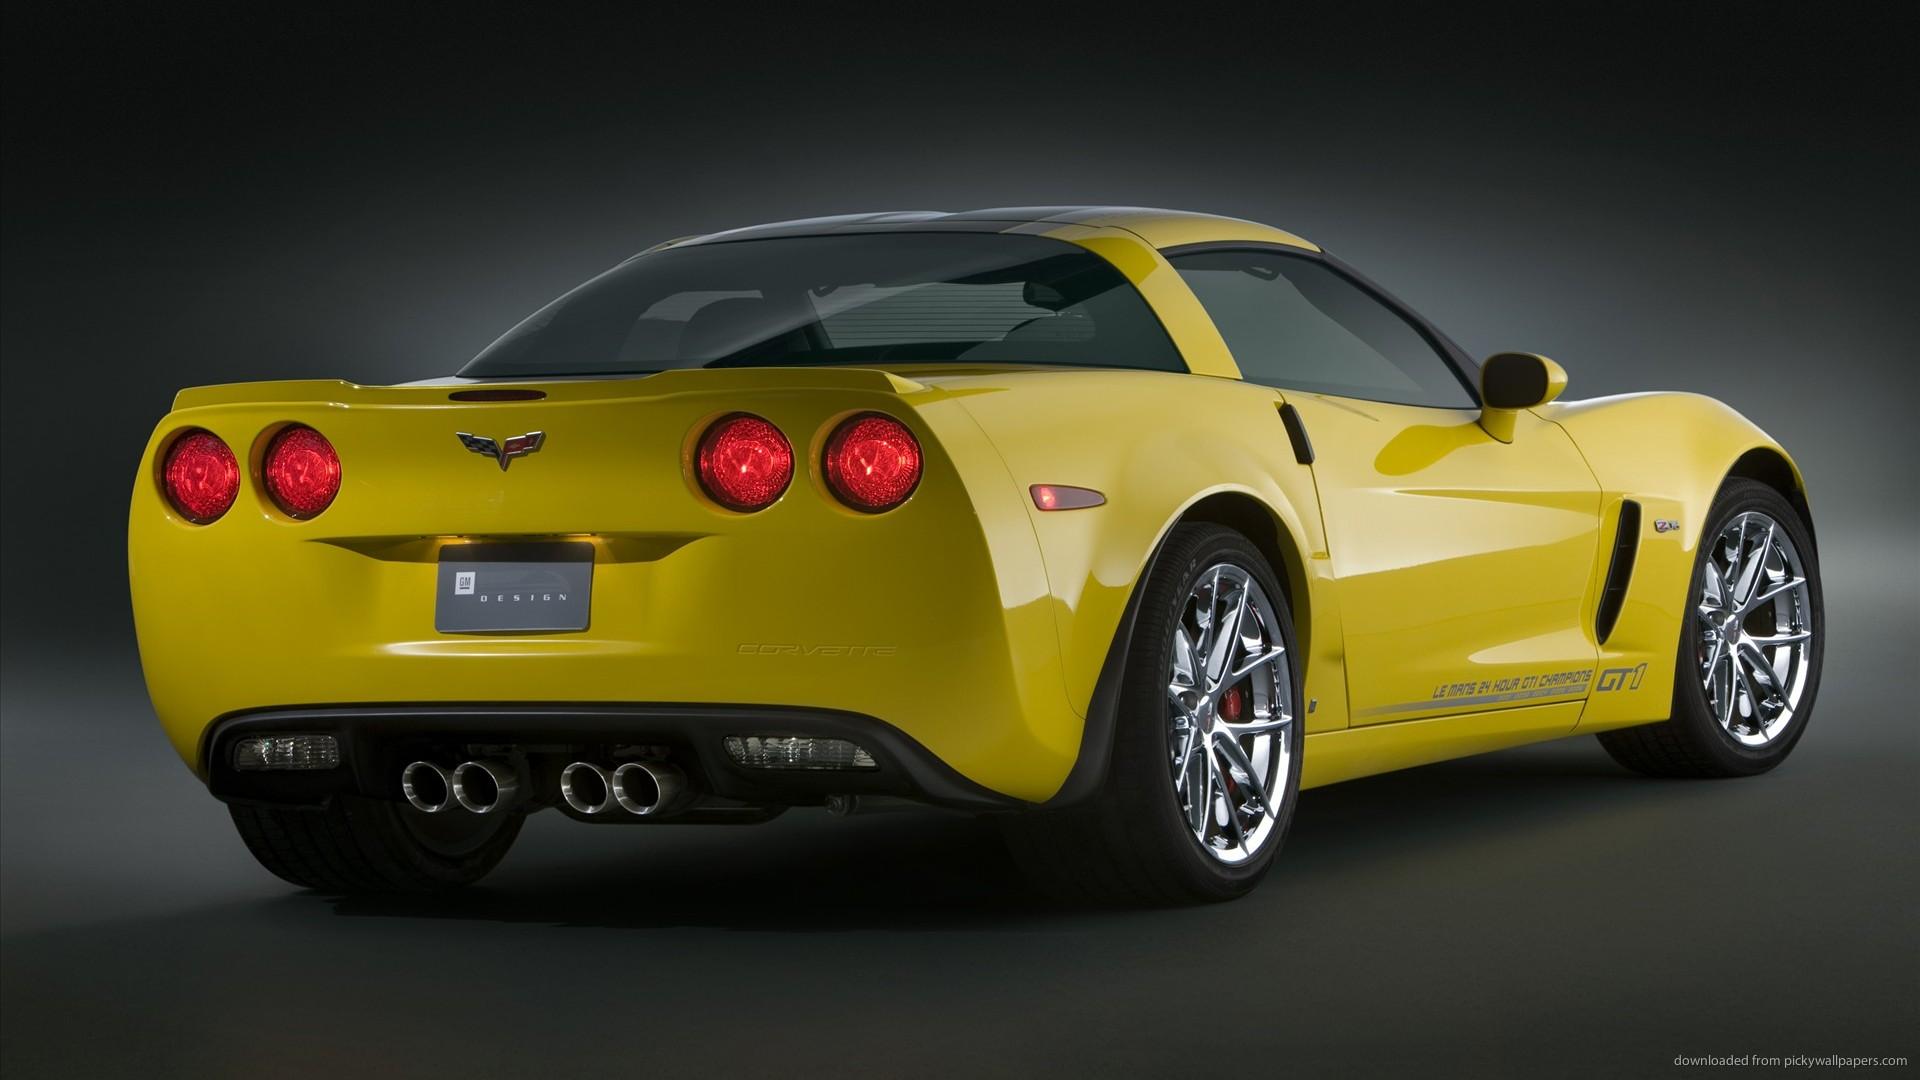 chevrolet yellow corvette wallpapers cars wallpaper 1920x1080 1920x1080